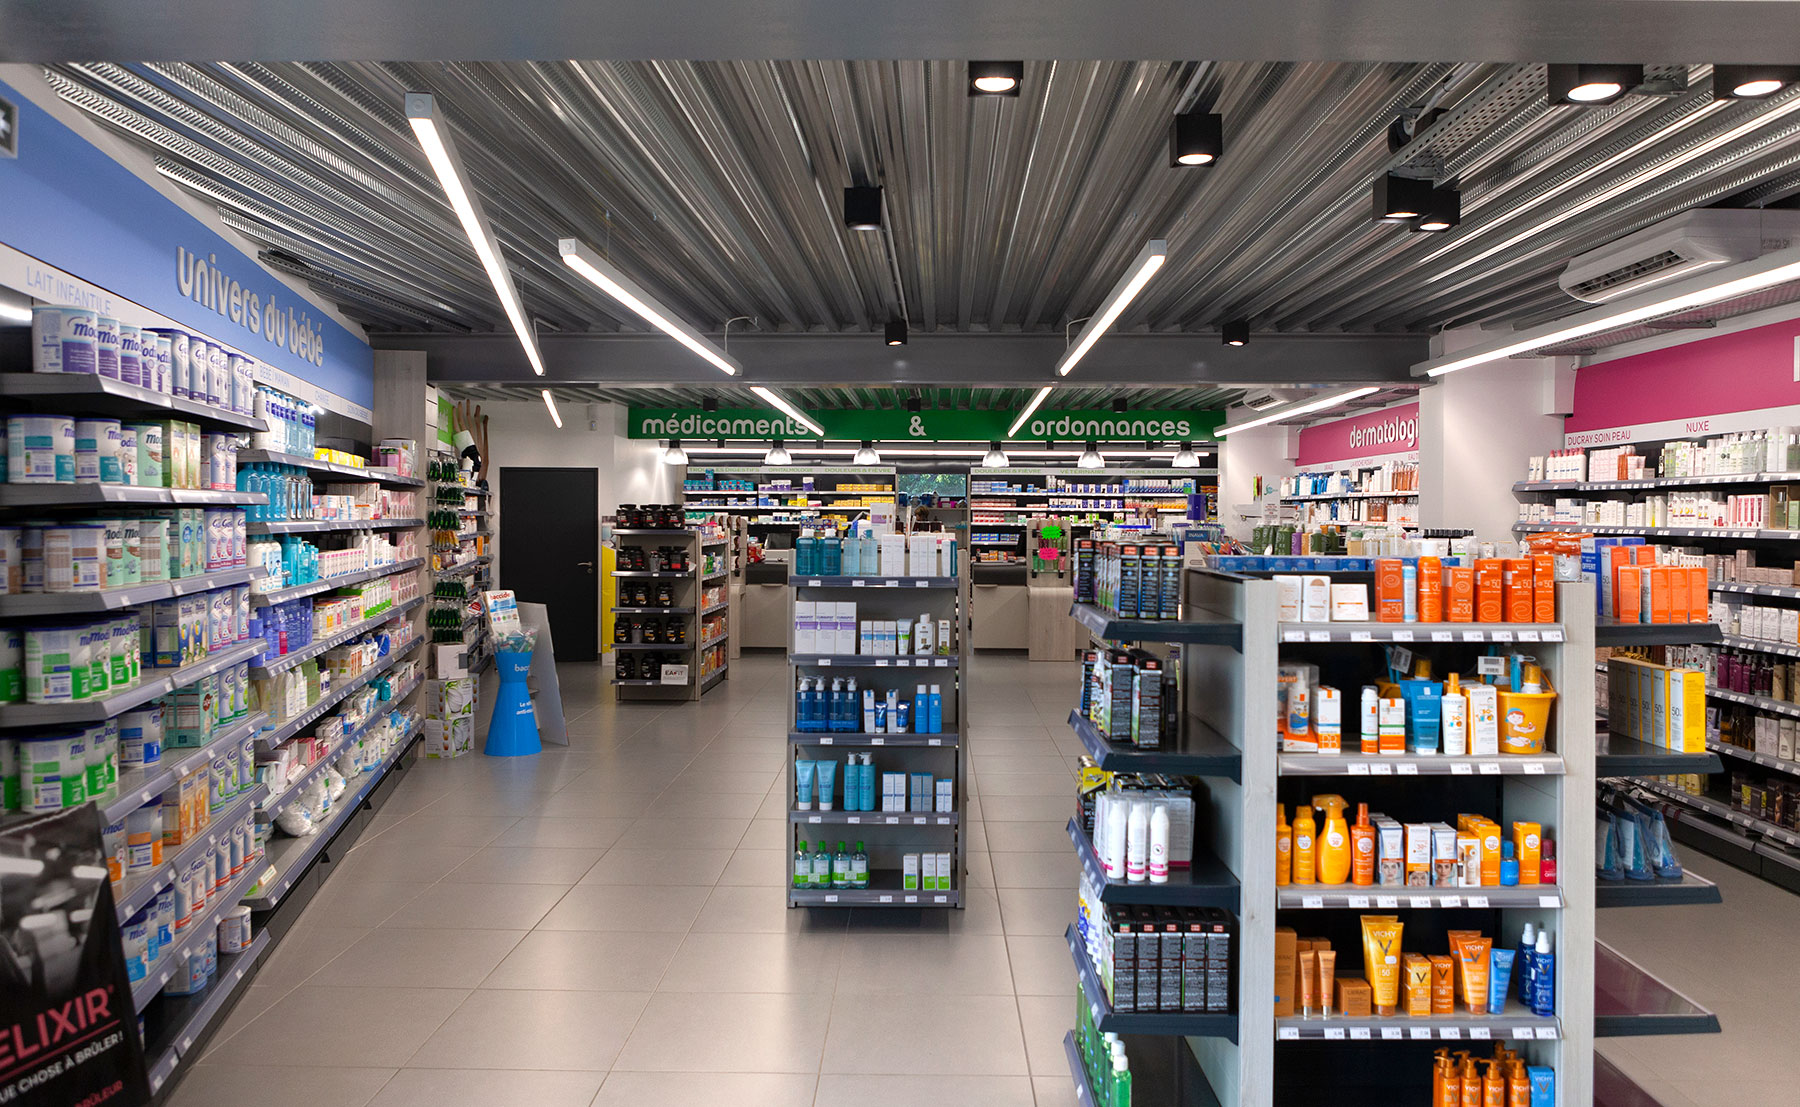 Pharmacie la Mayolle